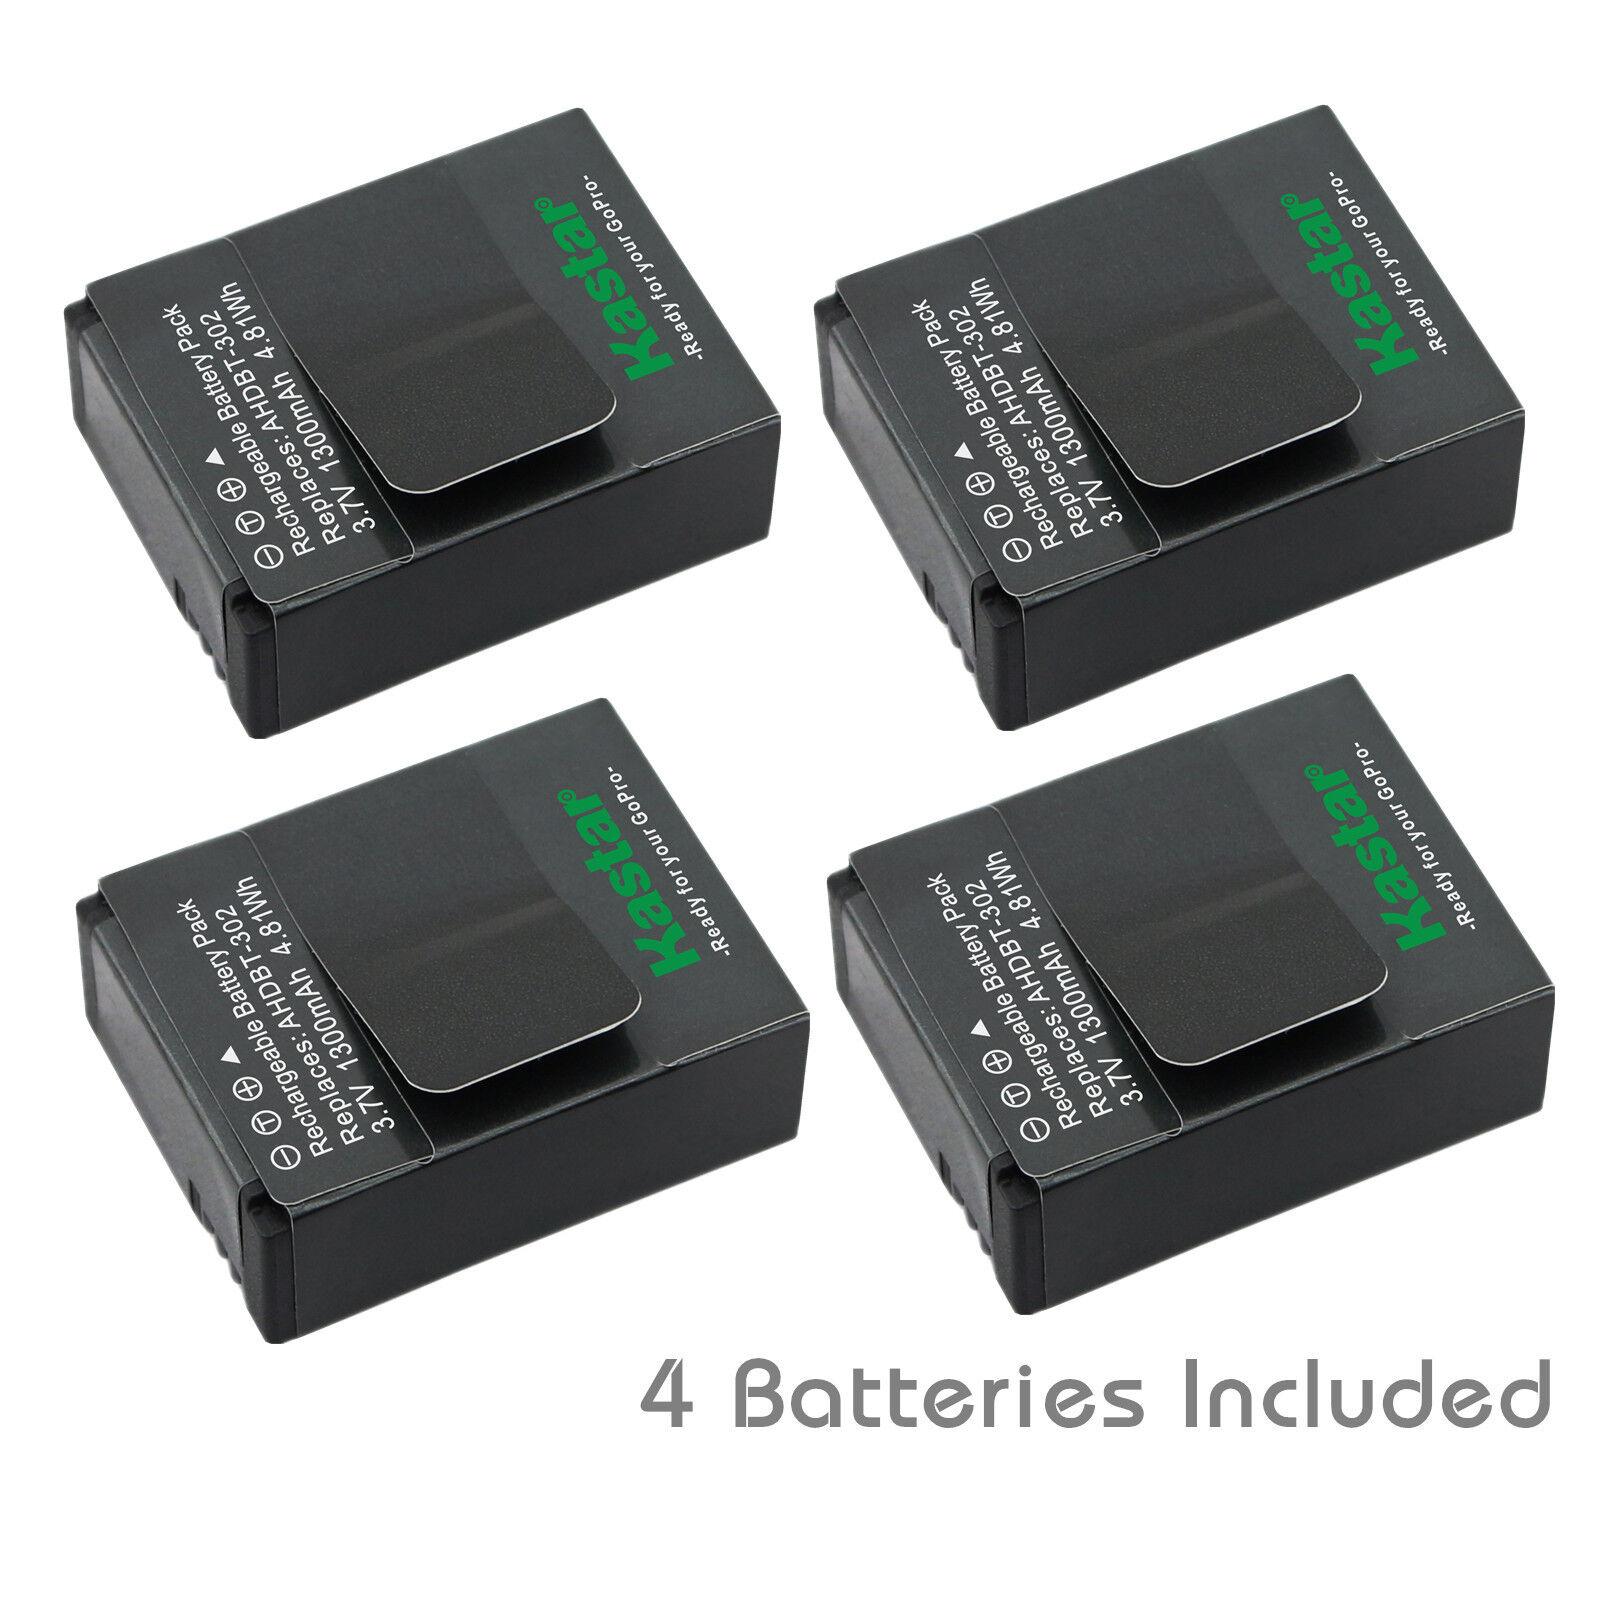 Купить Kastar GOPRO3 AHDBT-301 - Kastar Battery  GoPro HD HERO3 HERO3+ GoPro AHDBT-201 AHDBT-301 AHDBT-302